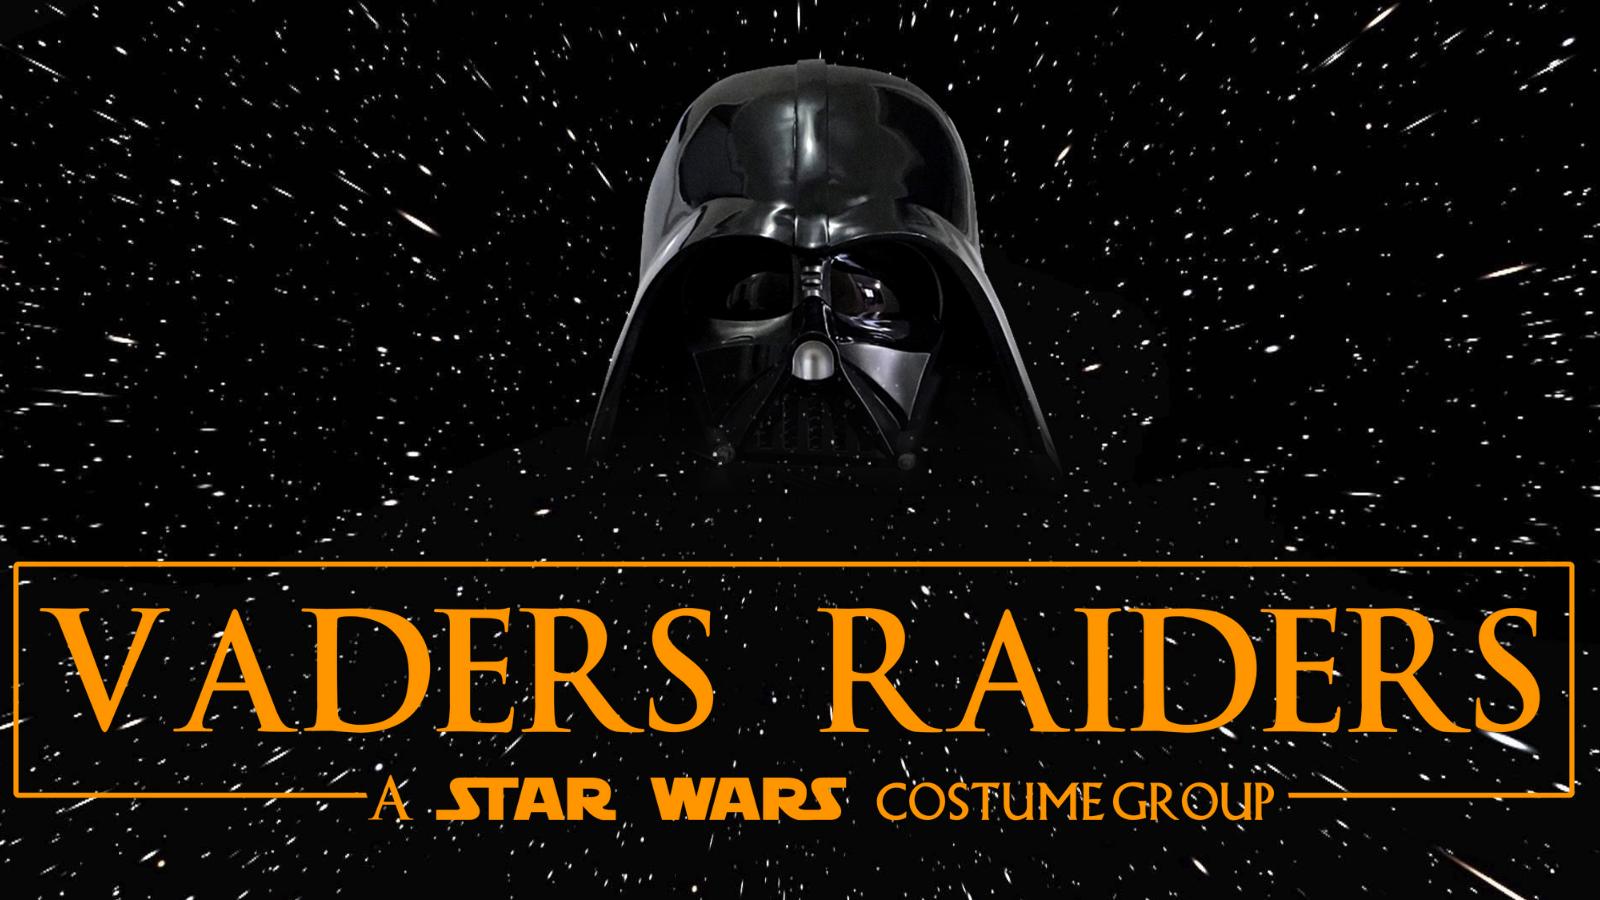 Varder's Raiders